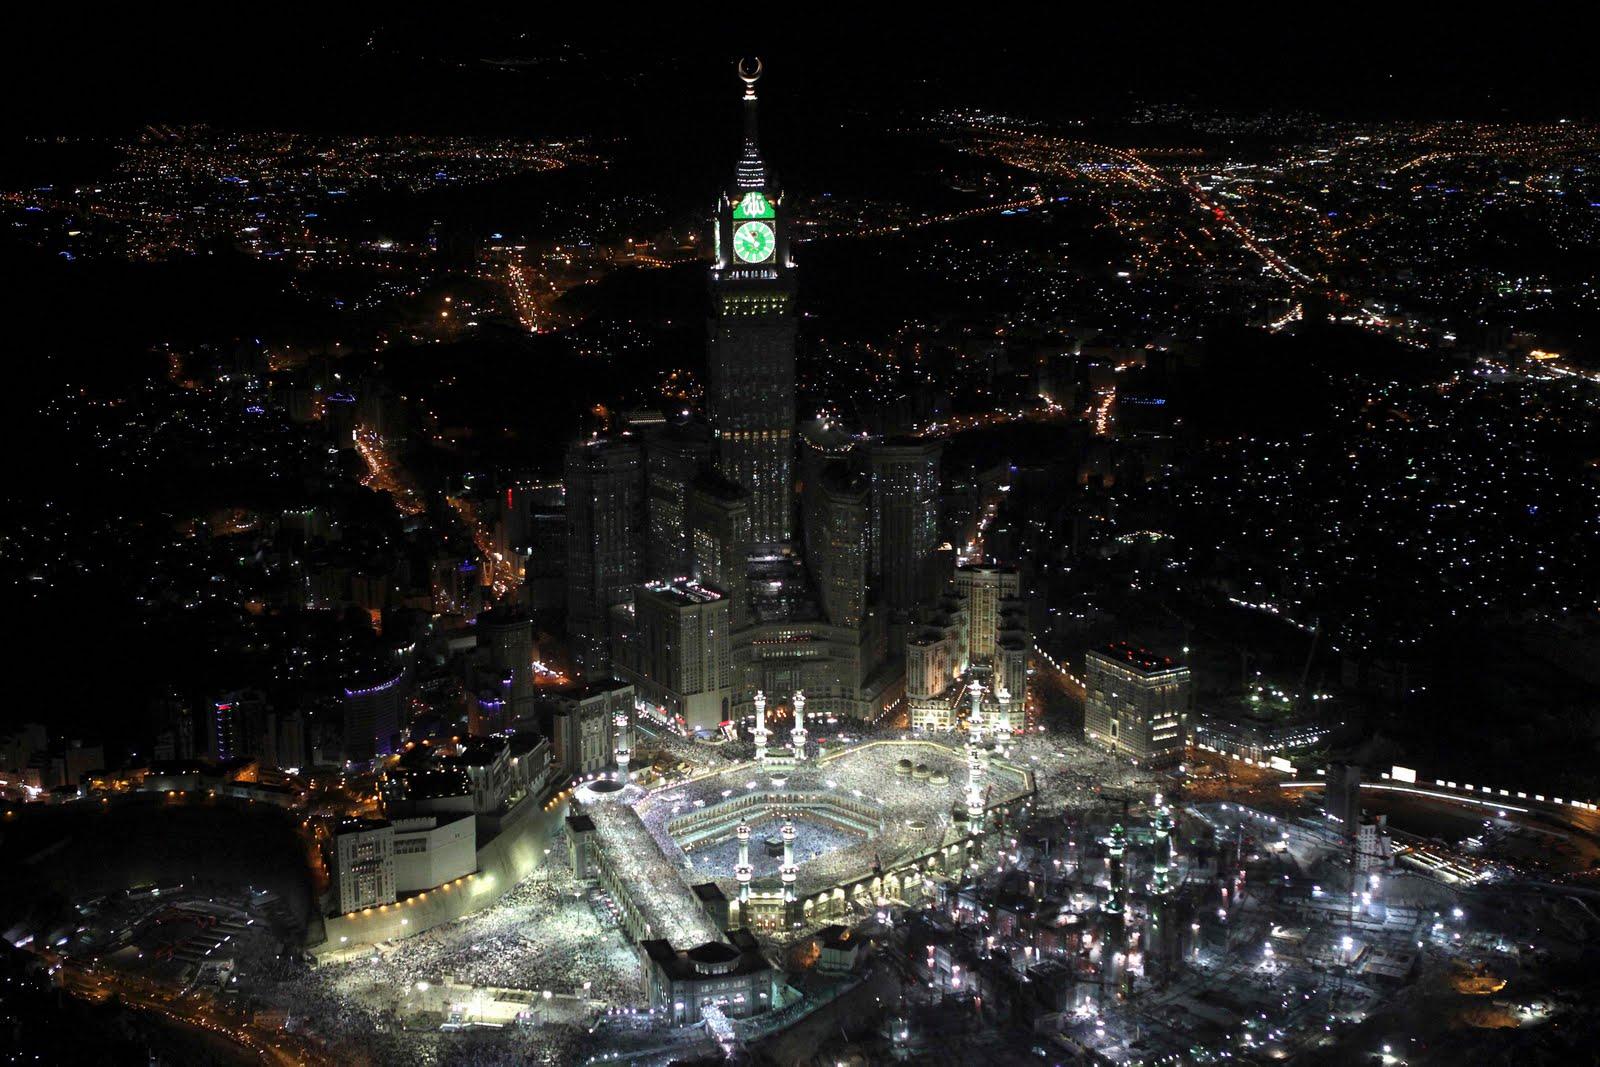 Makkah Royal Clock Tower Hotel Wallpapers 1600x1067